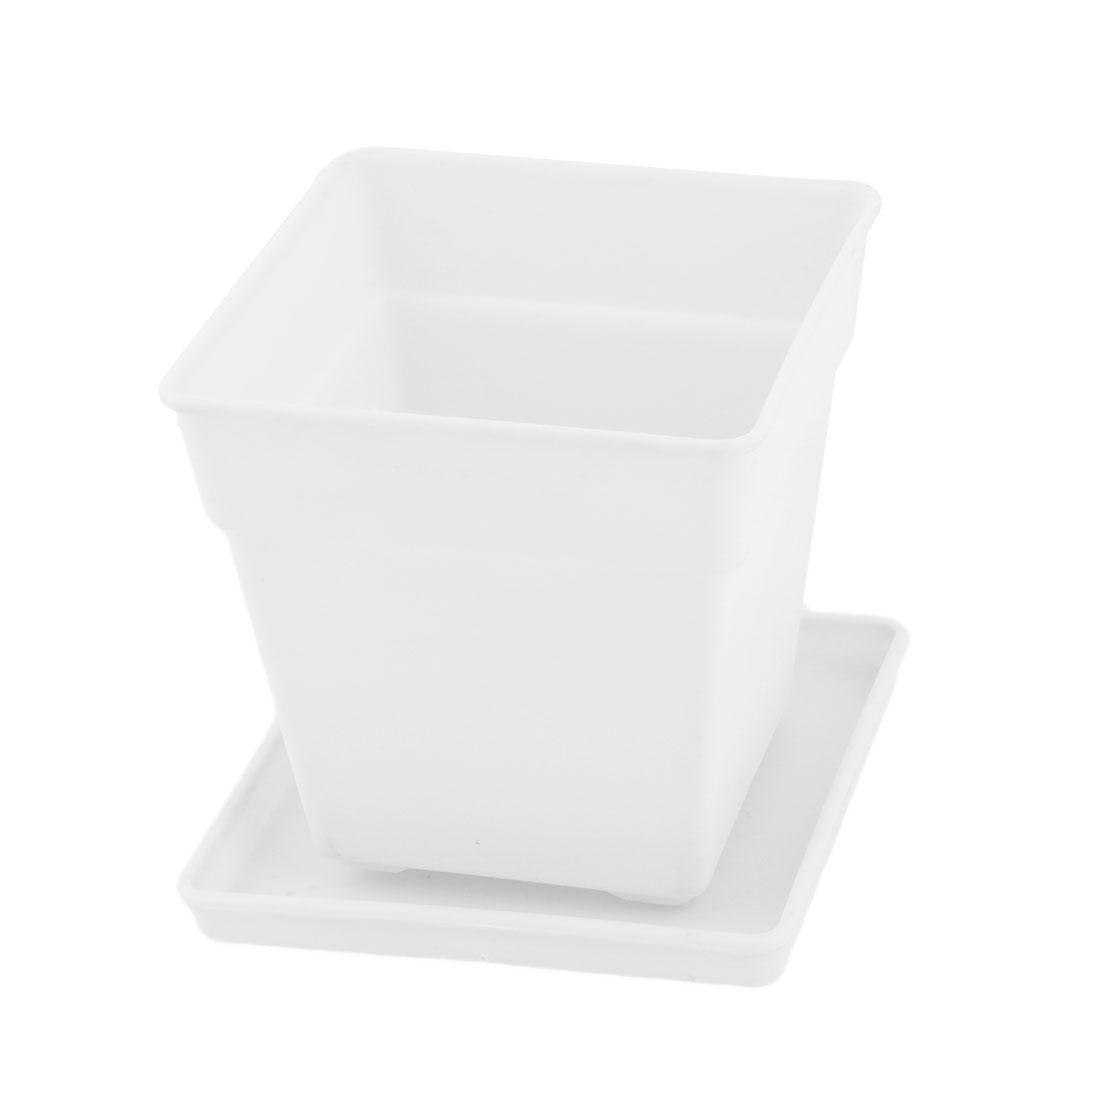 Desktop Decor Plastic Square Flower Grass Plant Pot Tray Holder Container White